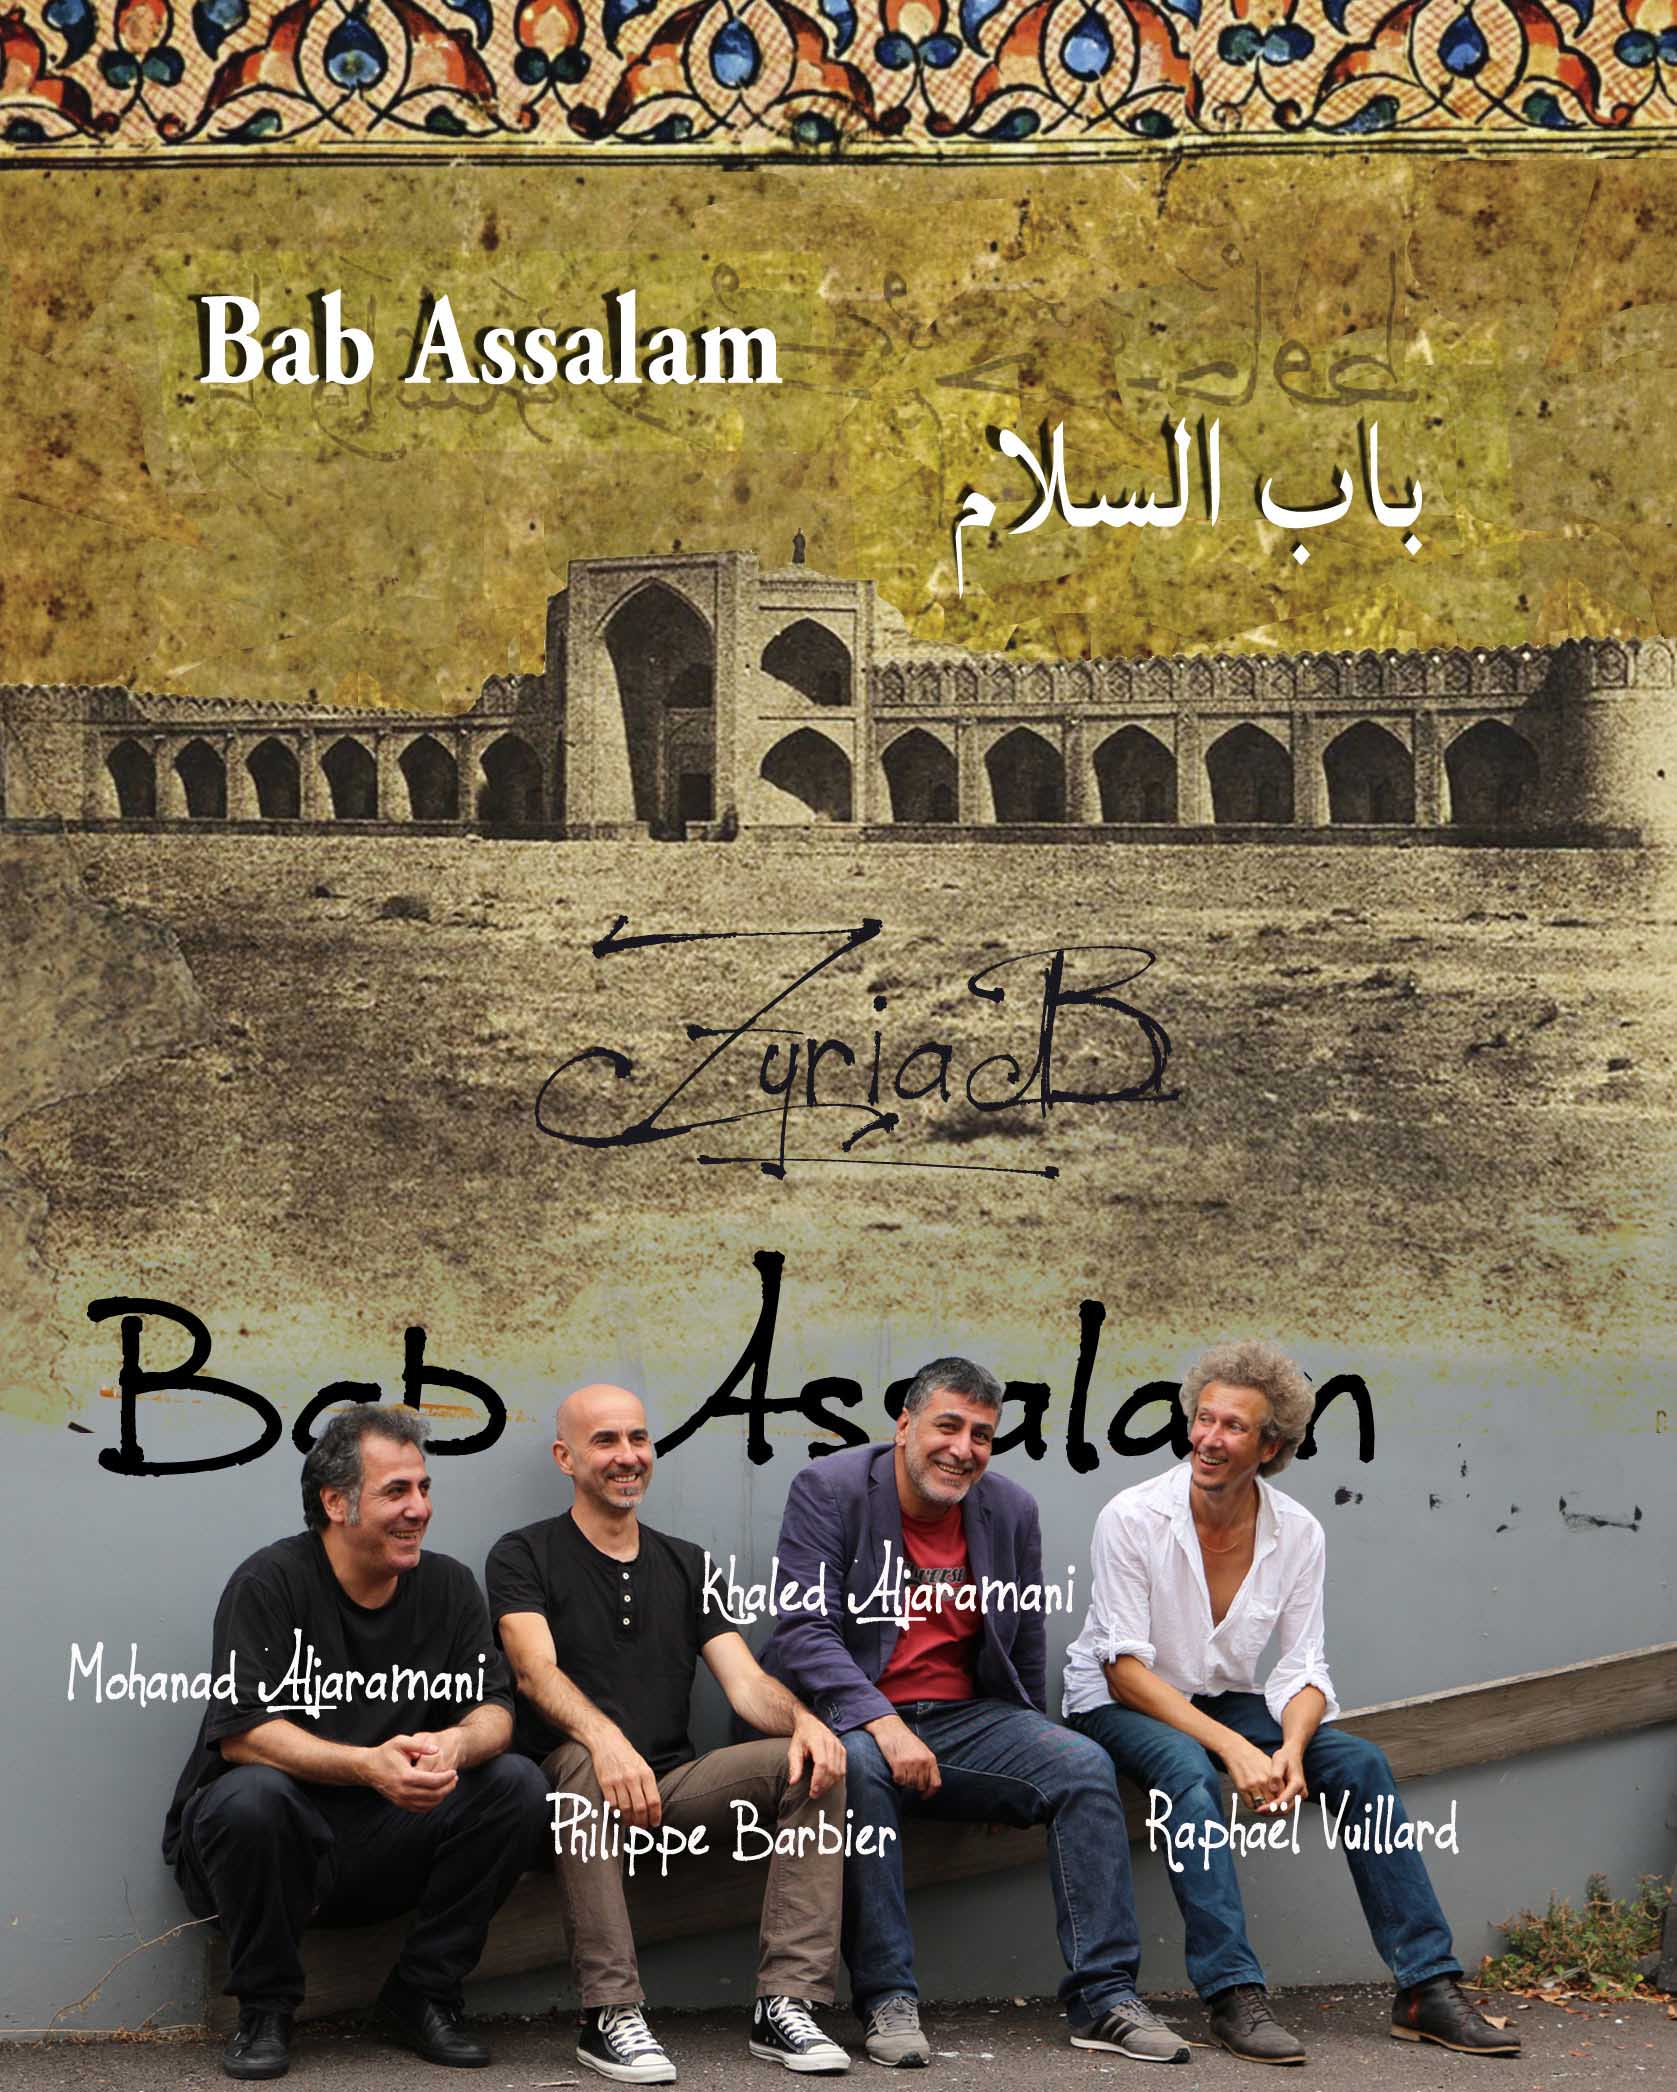 Bab Assalam web